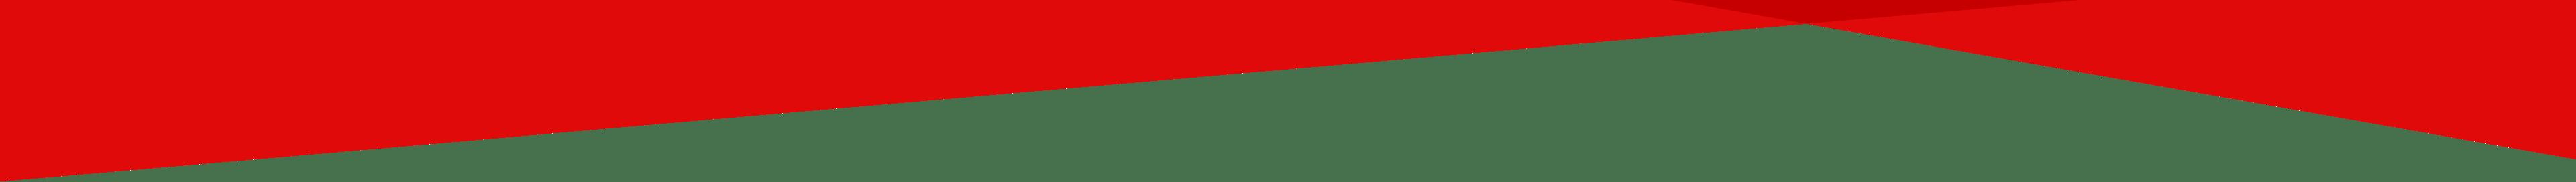 Questions & Answers – Virgin Mobile KSA